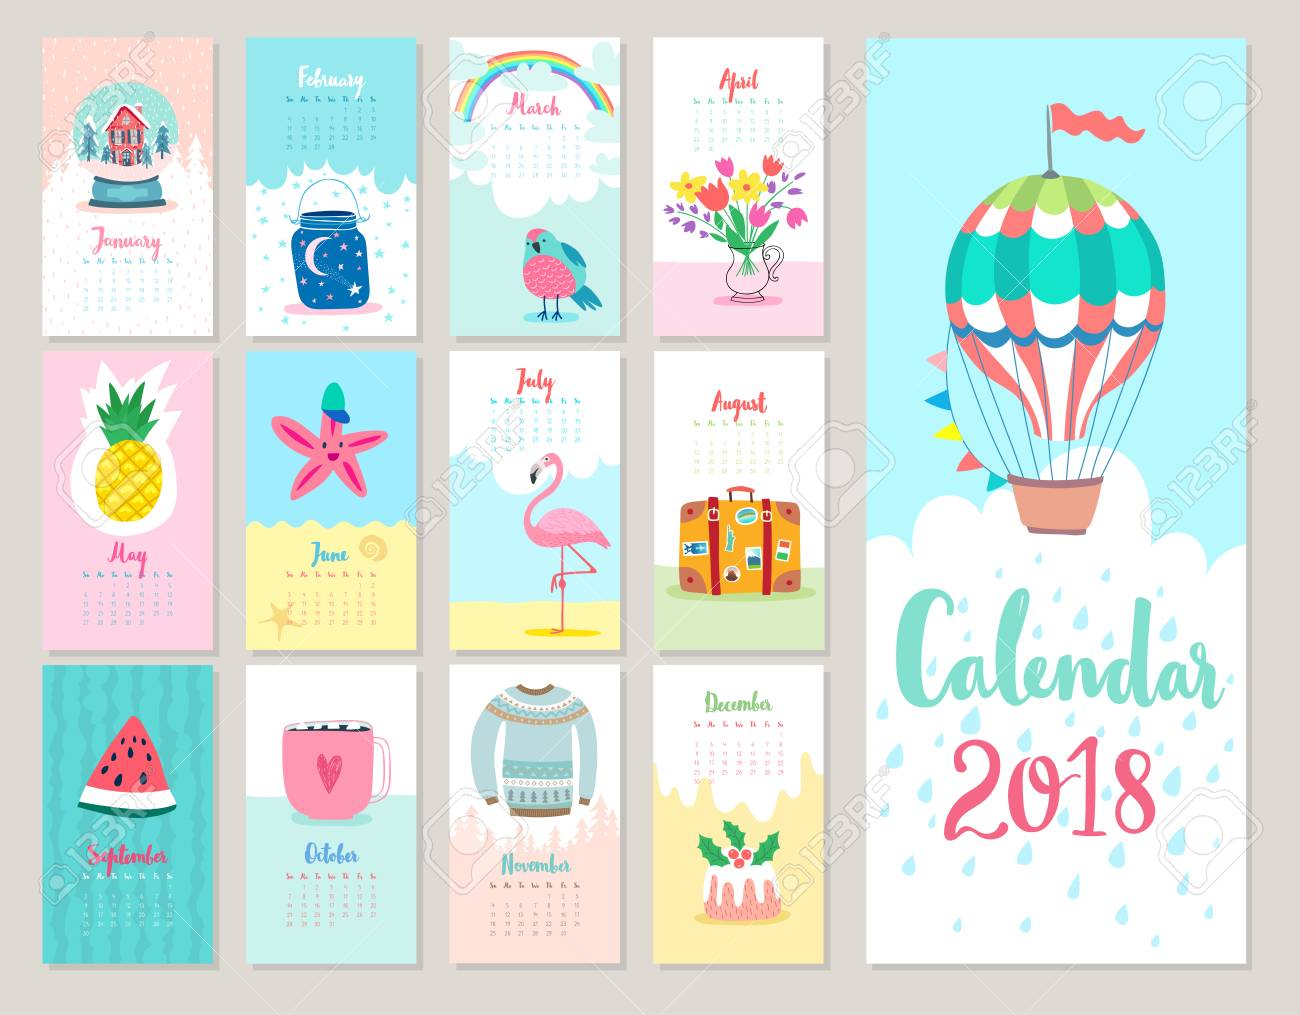 Calendar 2018. Cute monthly calendar with forest animals. - 86736660